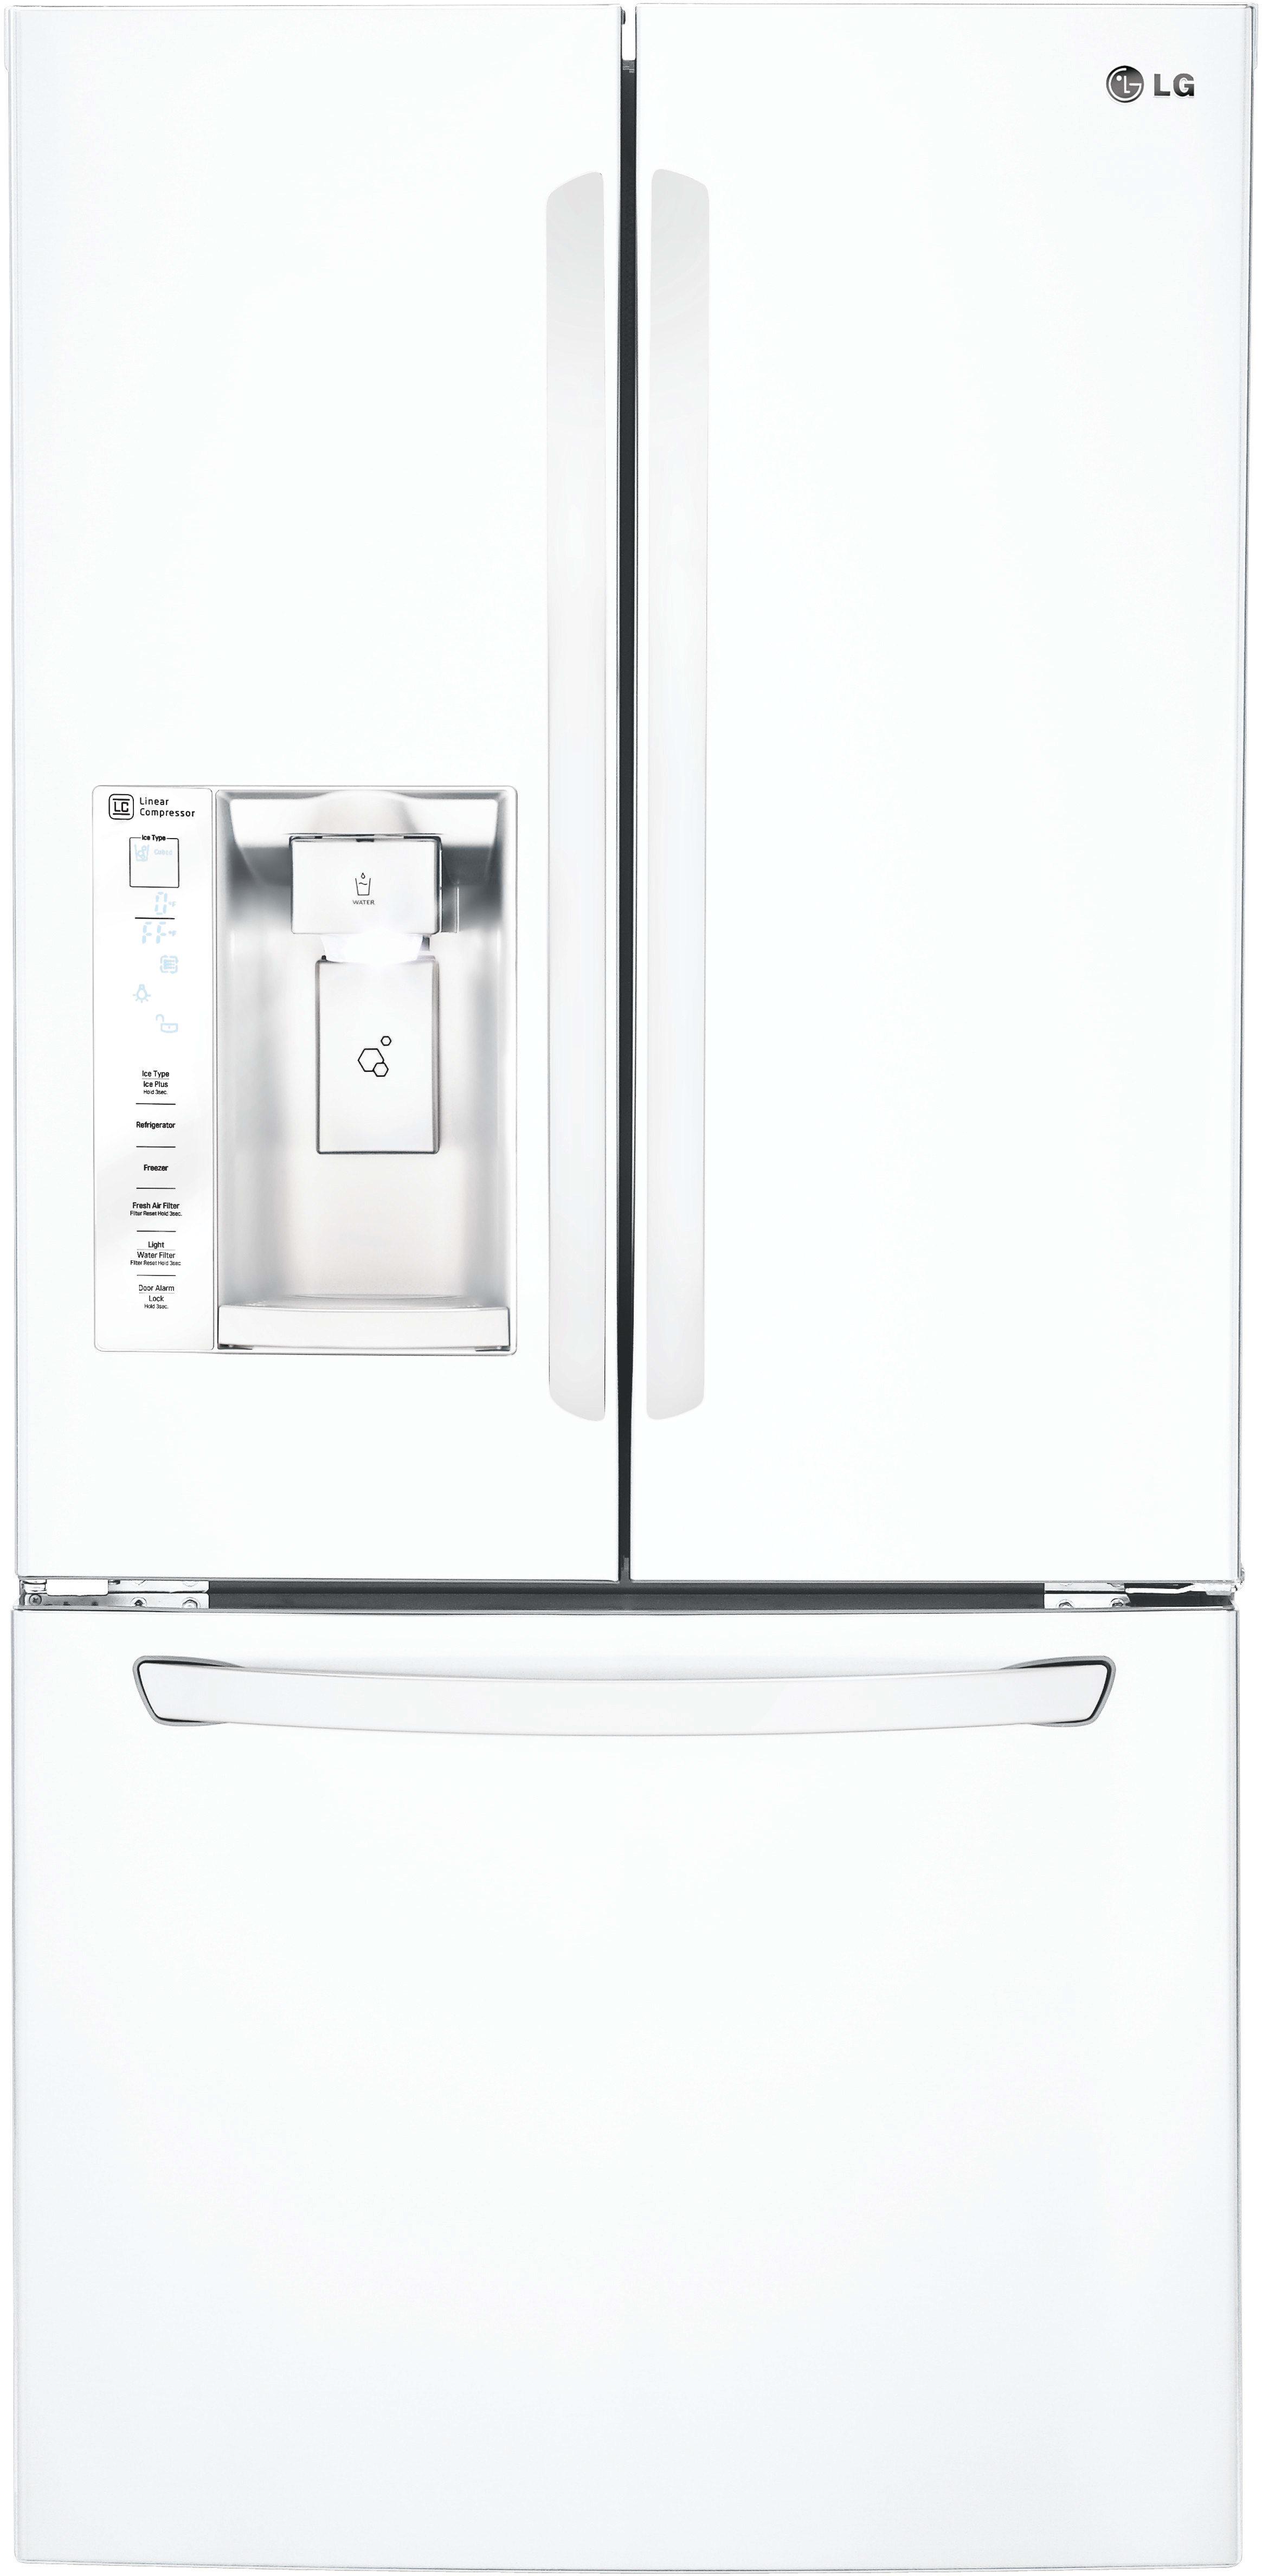 Lg Lfxs24623w 33 Inch French Door Refrigerator With Slim